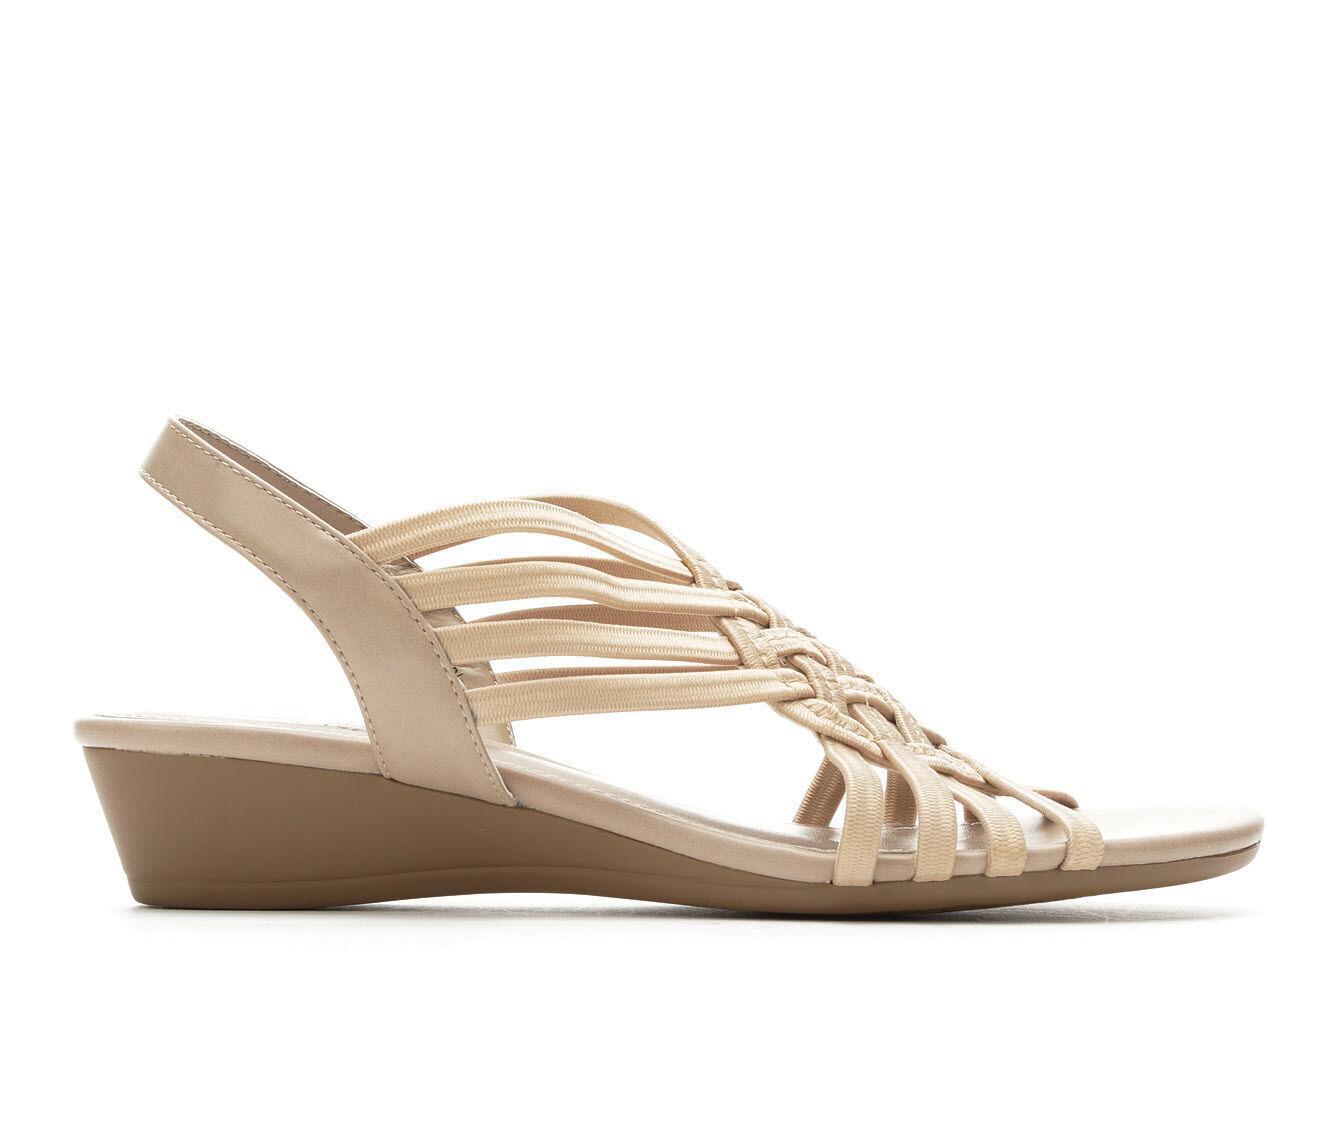 uk shoes_kd6211